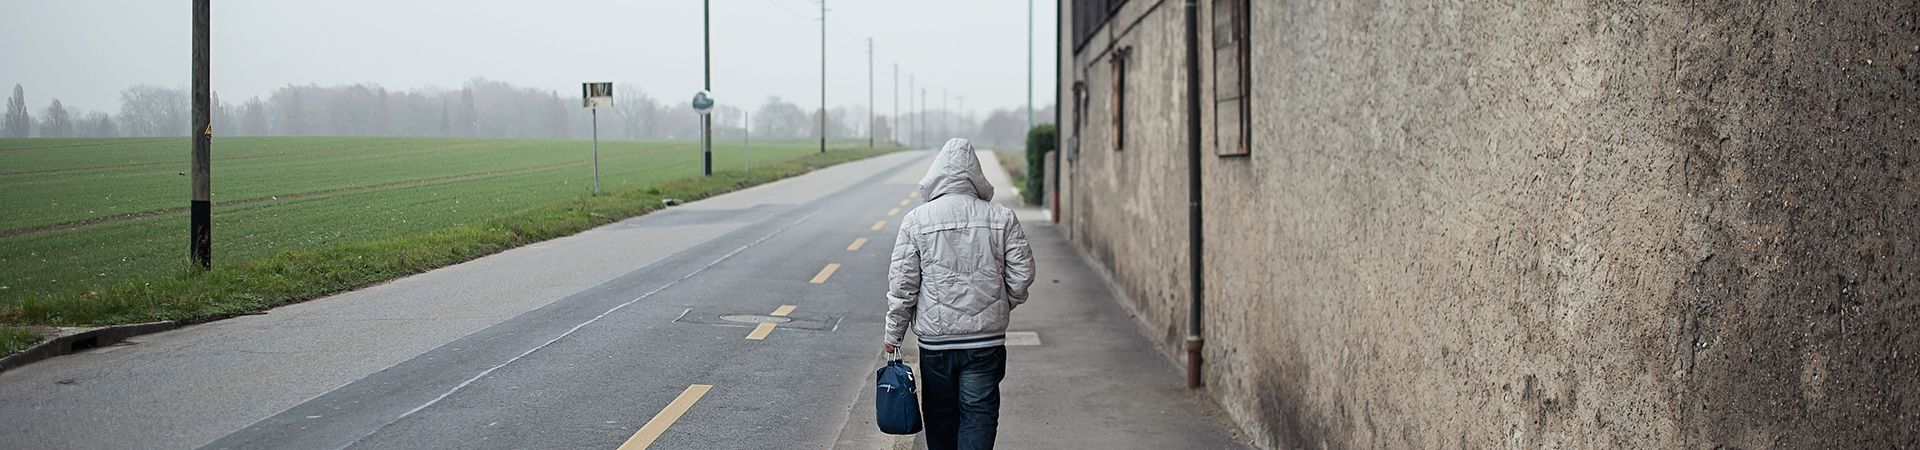 Hossein. La llar - Thierry Dana